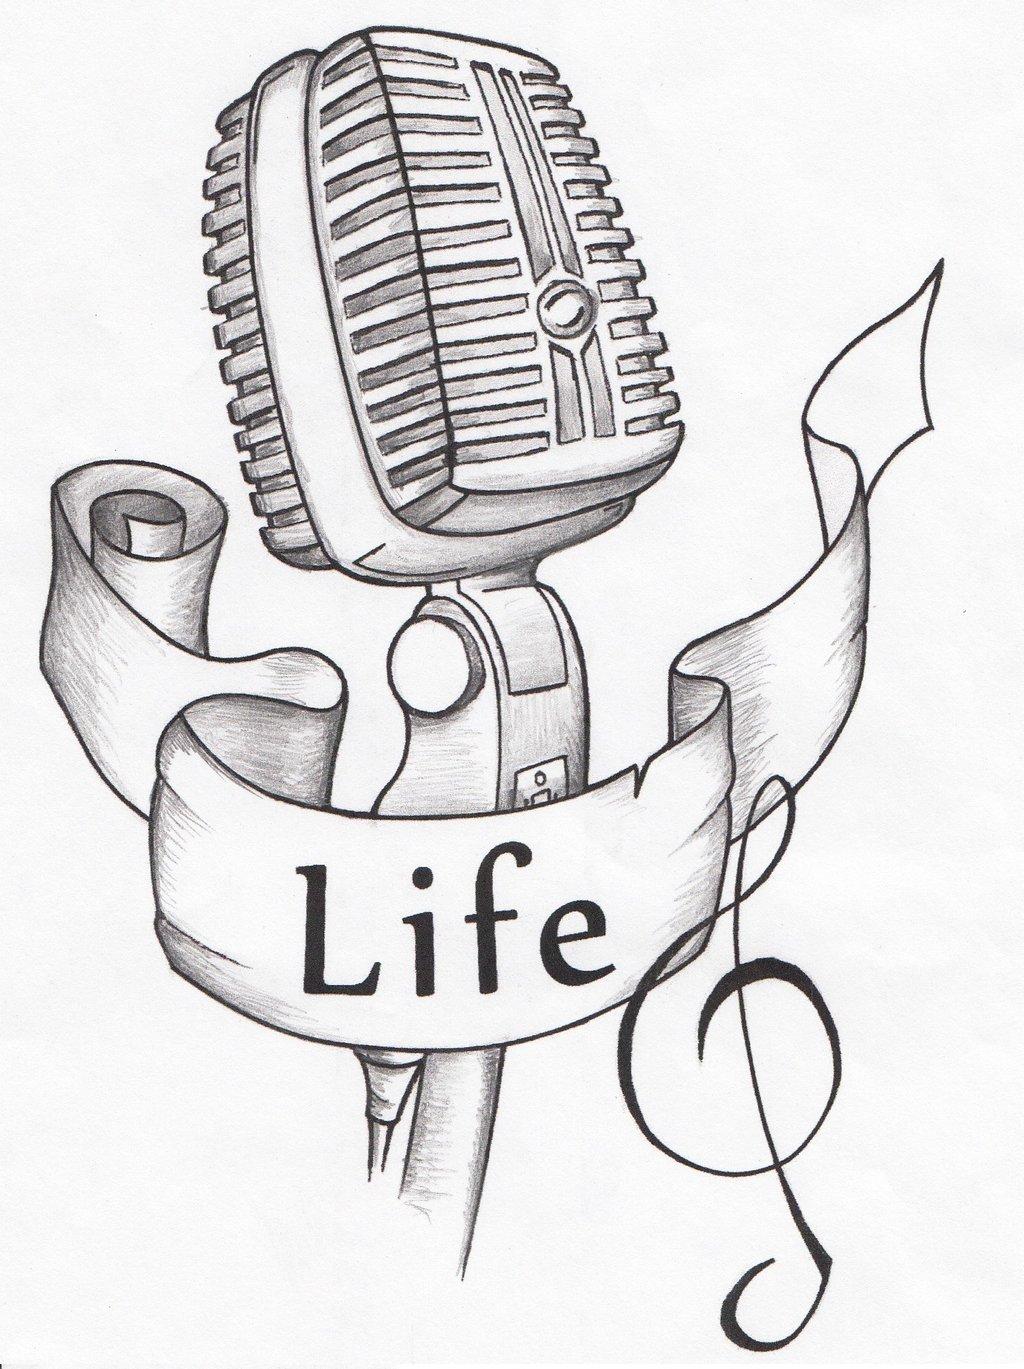 Drawn musician studio microphone Tattoo Tattoo DeviantArt Microphone by